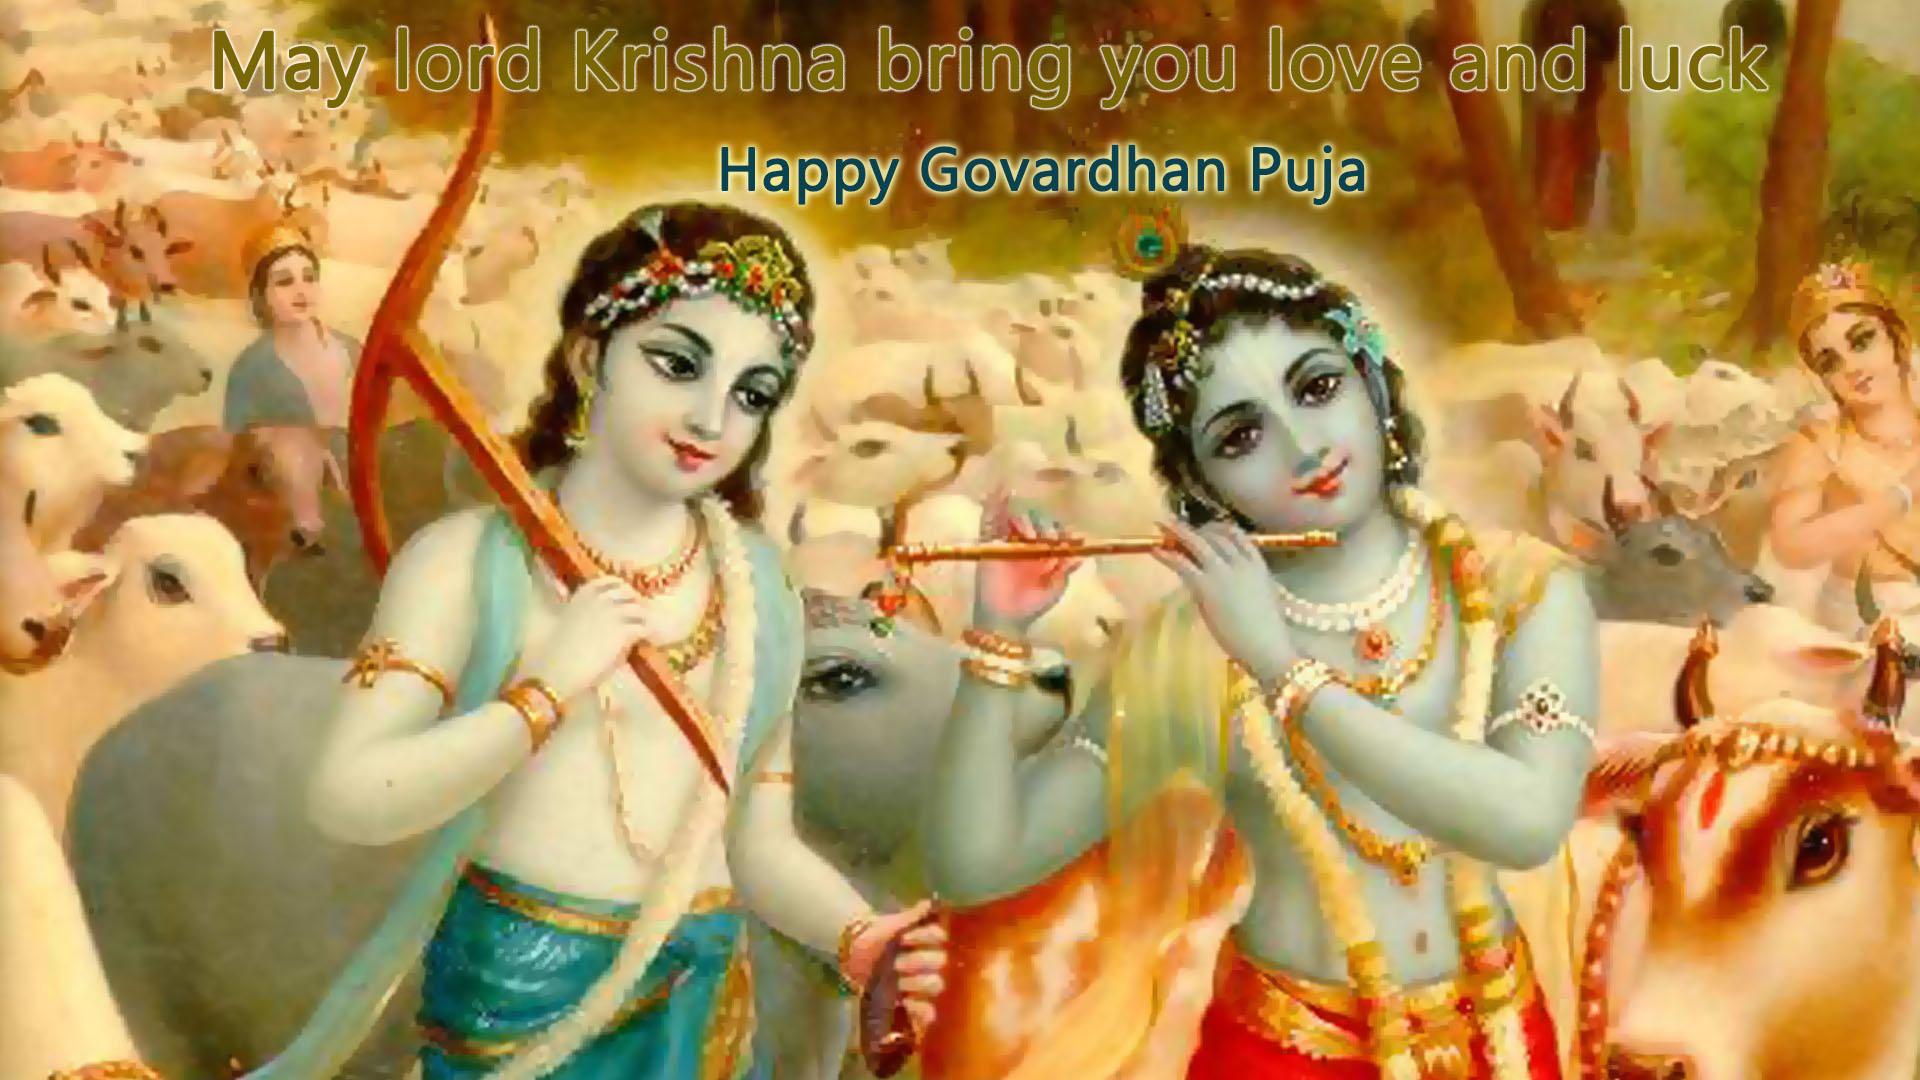 Govardhan Puja Images Hd